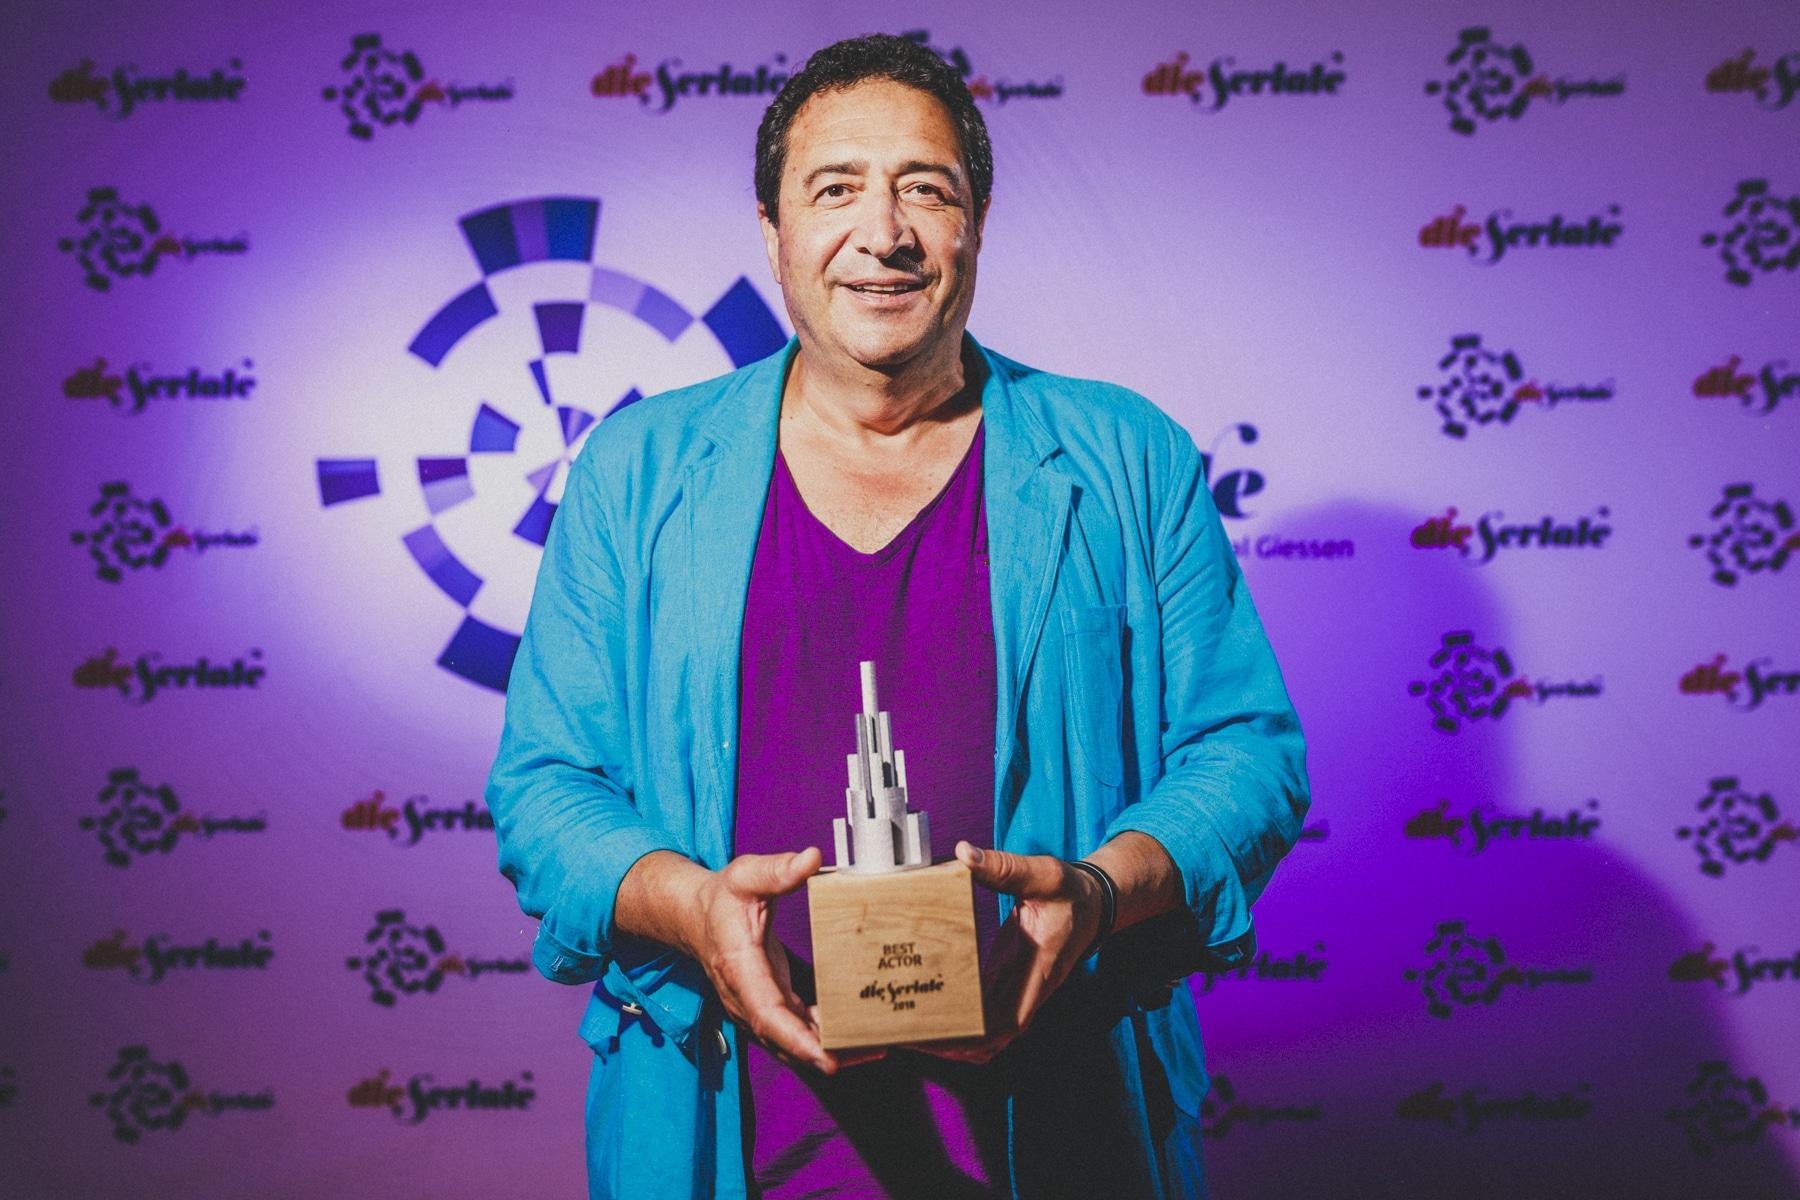 "BEST ACTOR - Burak Yüceil, executive producer of ""Kanaga"", from Turkey, accepted the award on behalf of Mehmet Günsür . | Photo by Christoforos Mechanezidis"